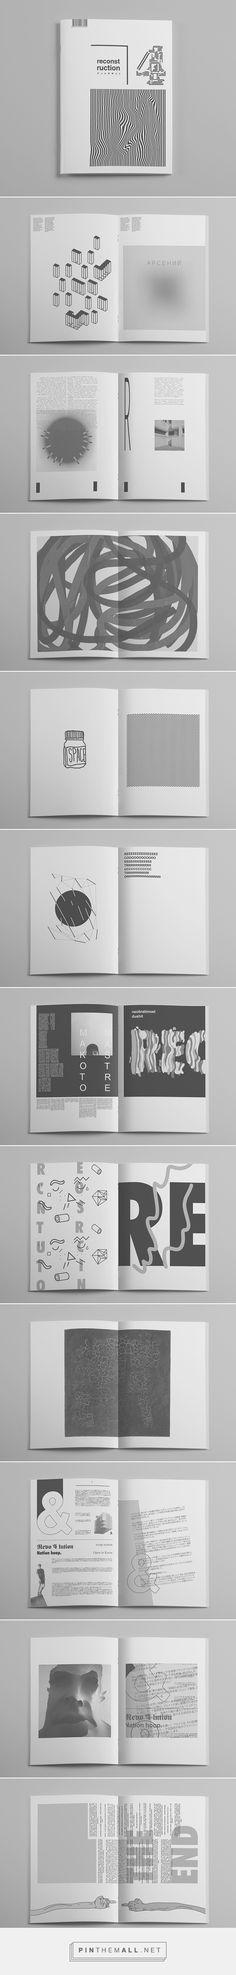 RE4 Fanzine by Ignat Makoto